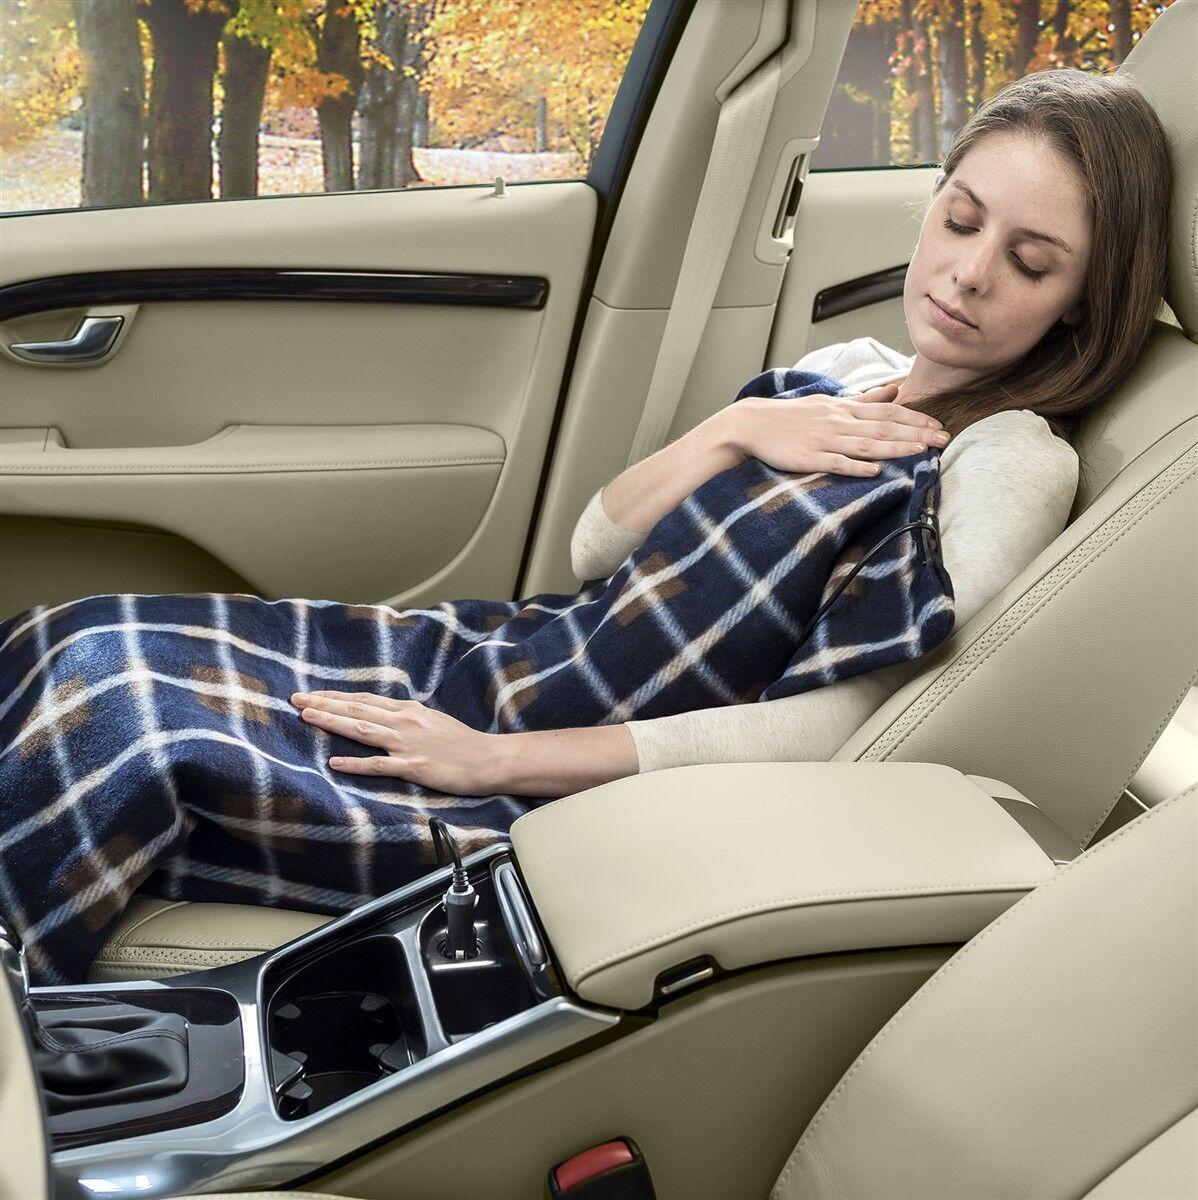 Blue Plaid Electrical 12V Travel Warm Fleece Blanket Throw Plug In For Cars Bedding